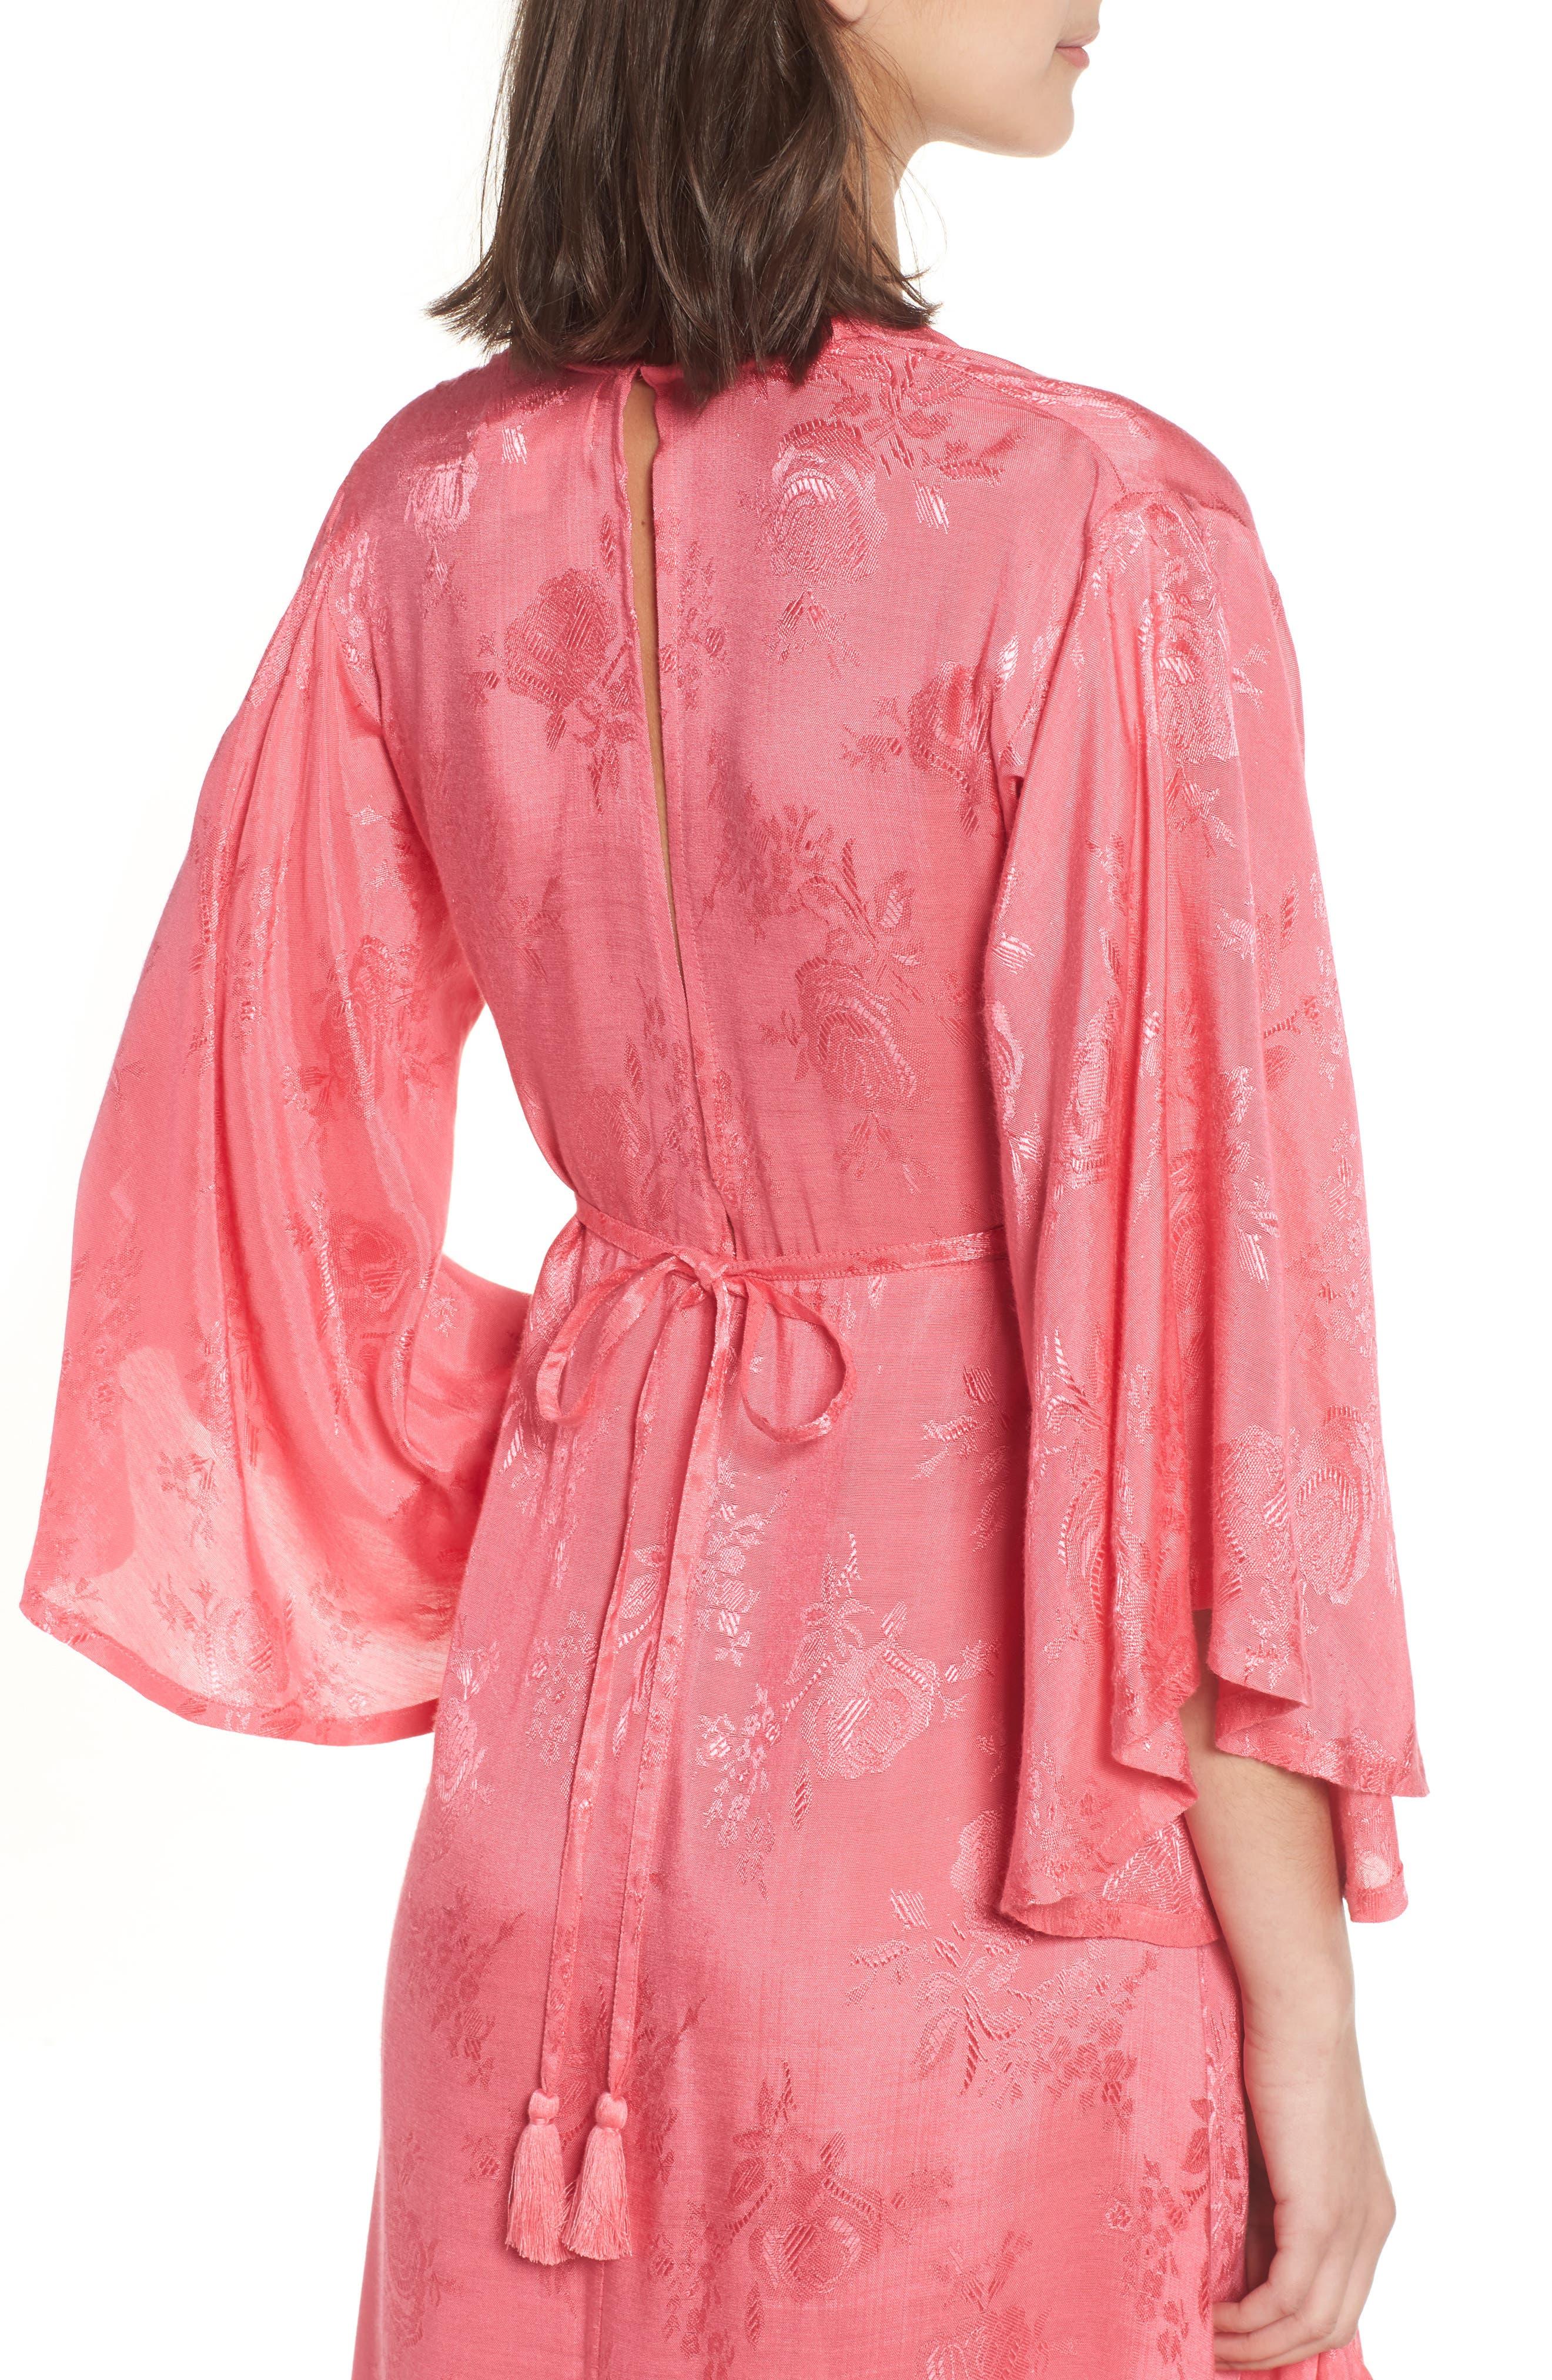 Florence Handkerchief Hem Dress,                             Alternate thumbnail 4, color,                             650